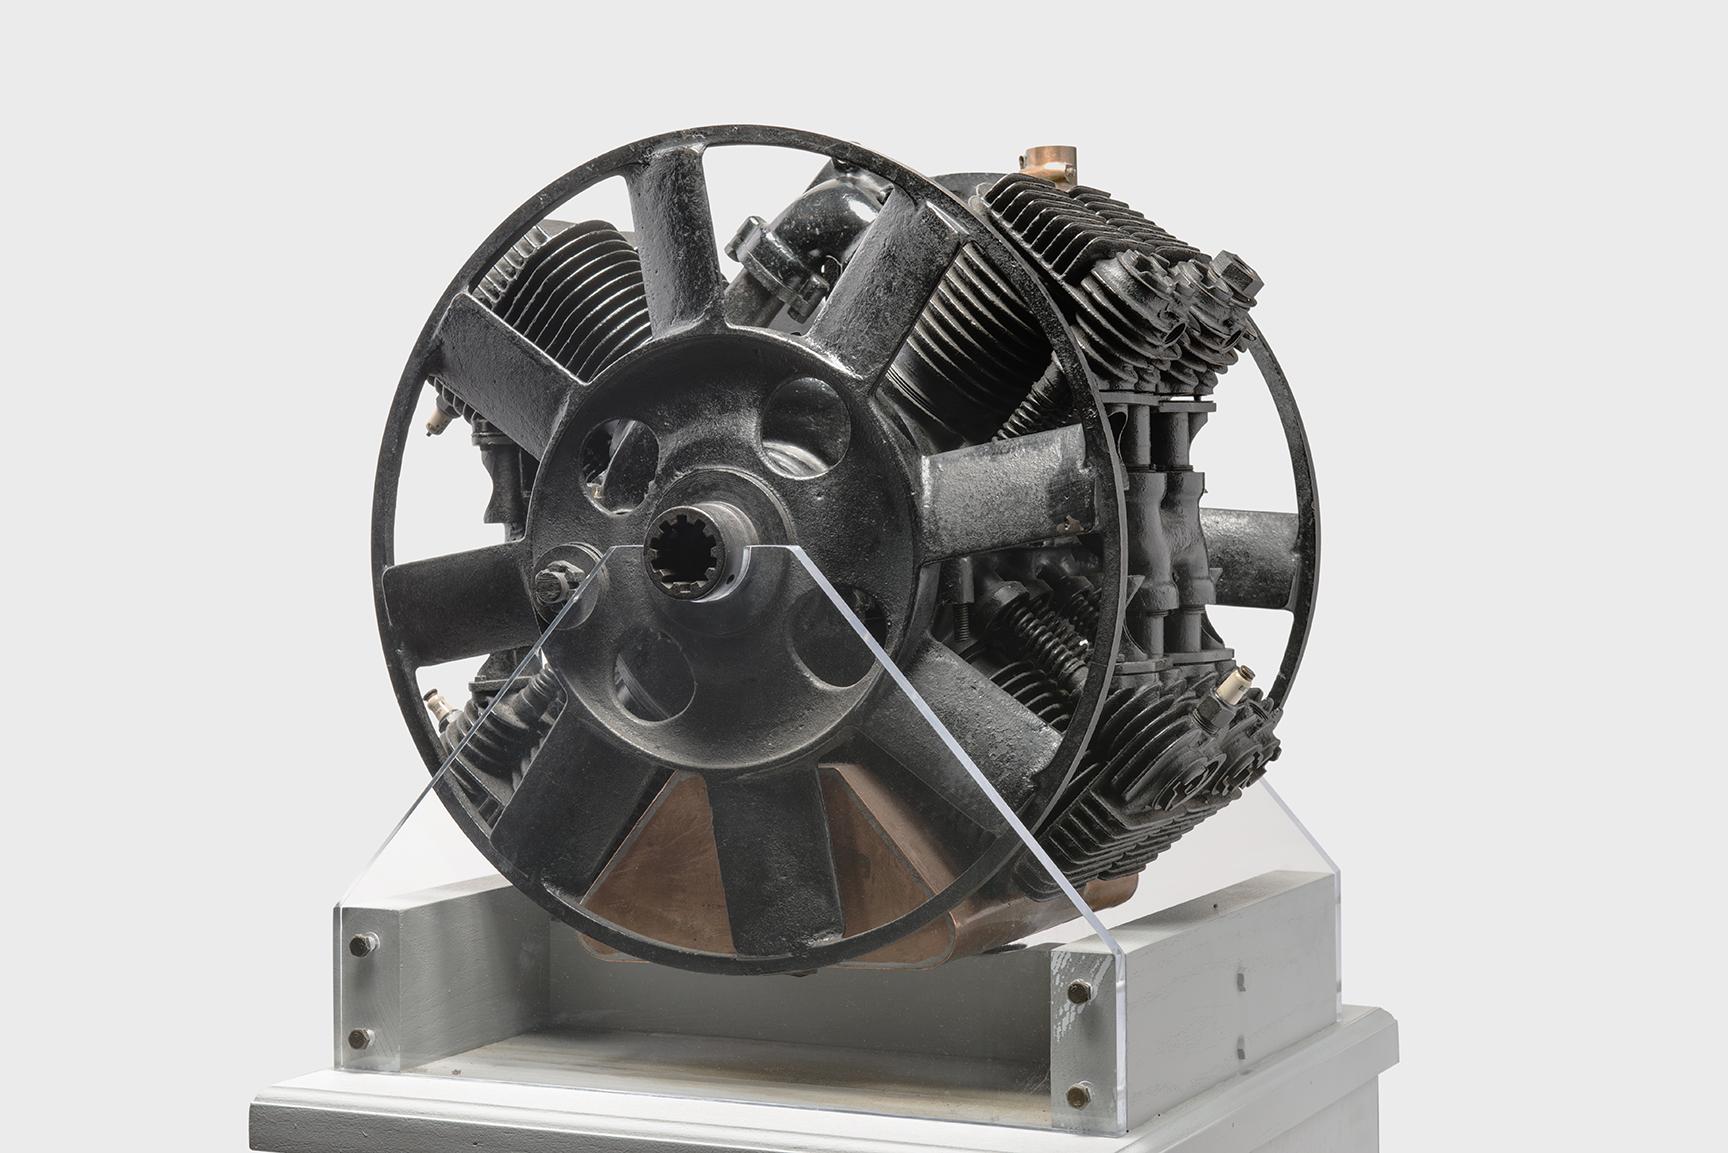 1925 Ford X-8 Engine